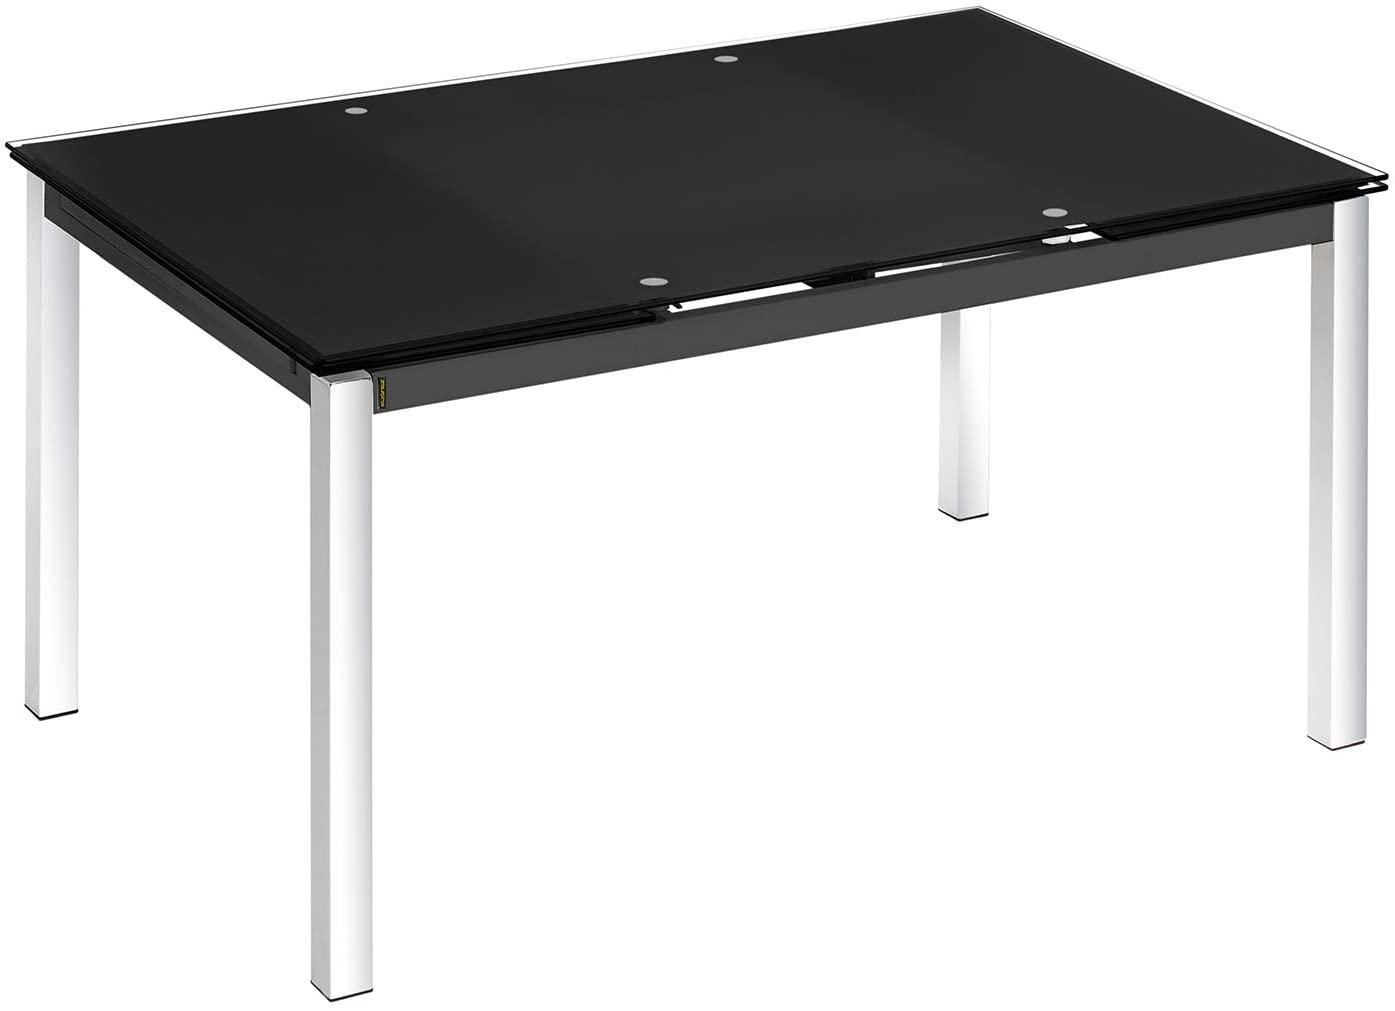 Mesa extensible cristal color negro y pata cromada comedor salon 140/200x90x75